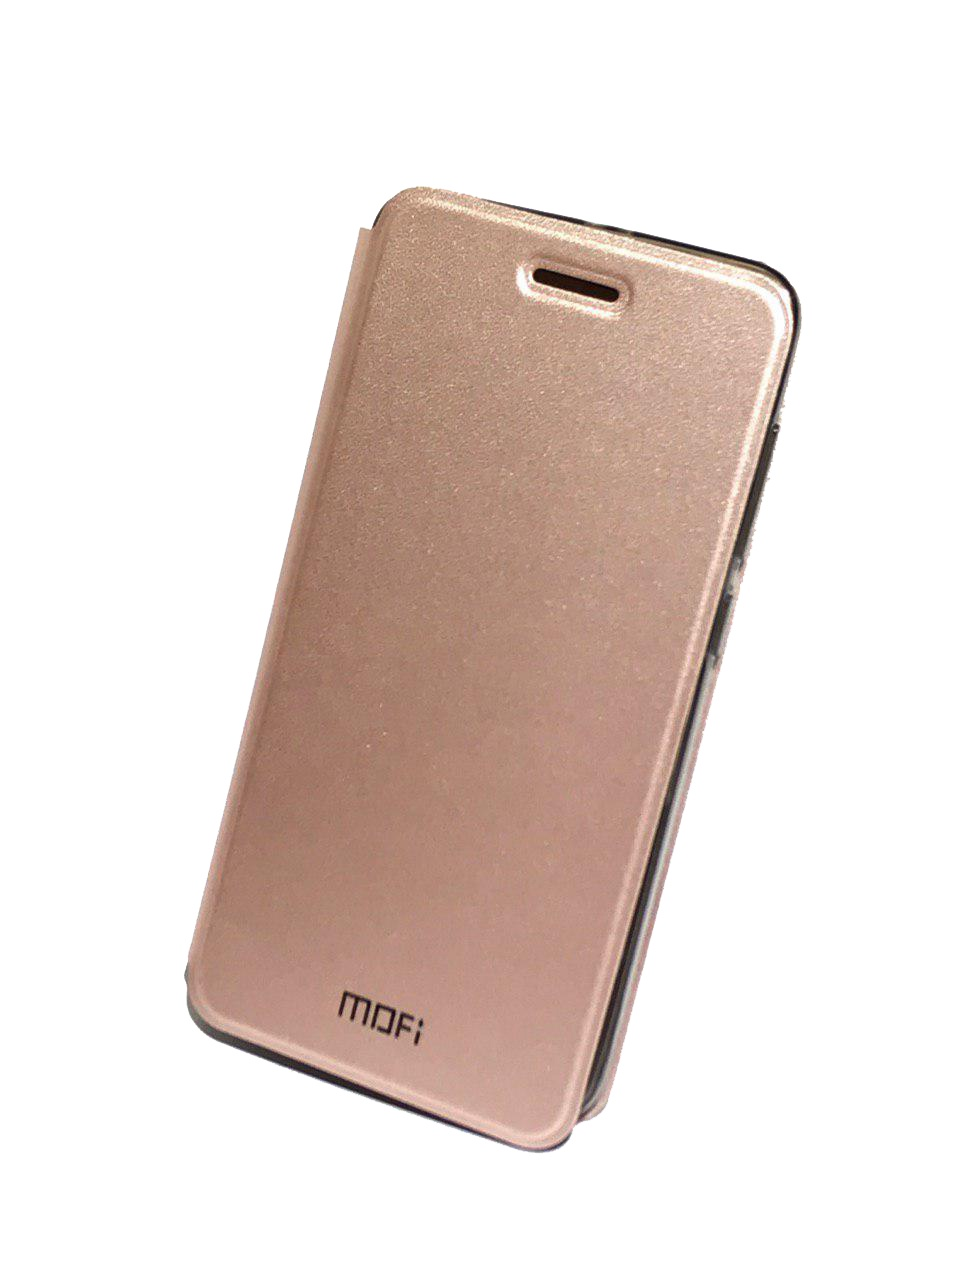 Чехол для Xiaomi Redmi Note 4X Книжка Pearl Xiaomi Redmi Note 4X Rose Gold перфорированный чехол книжка для redmi note 4 gold